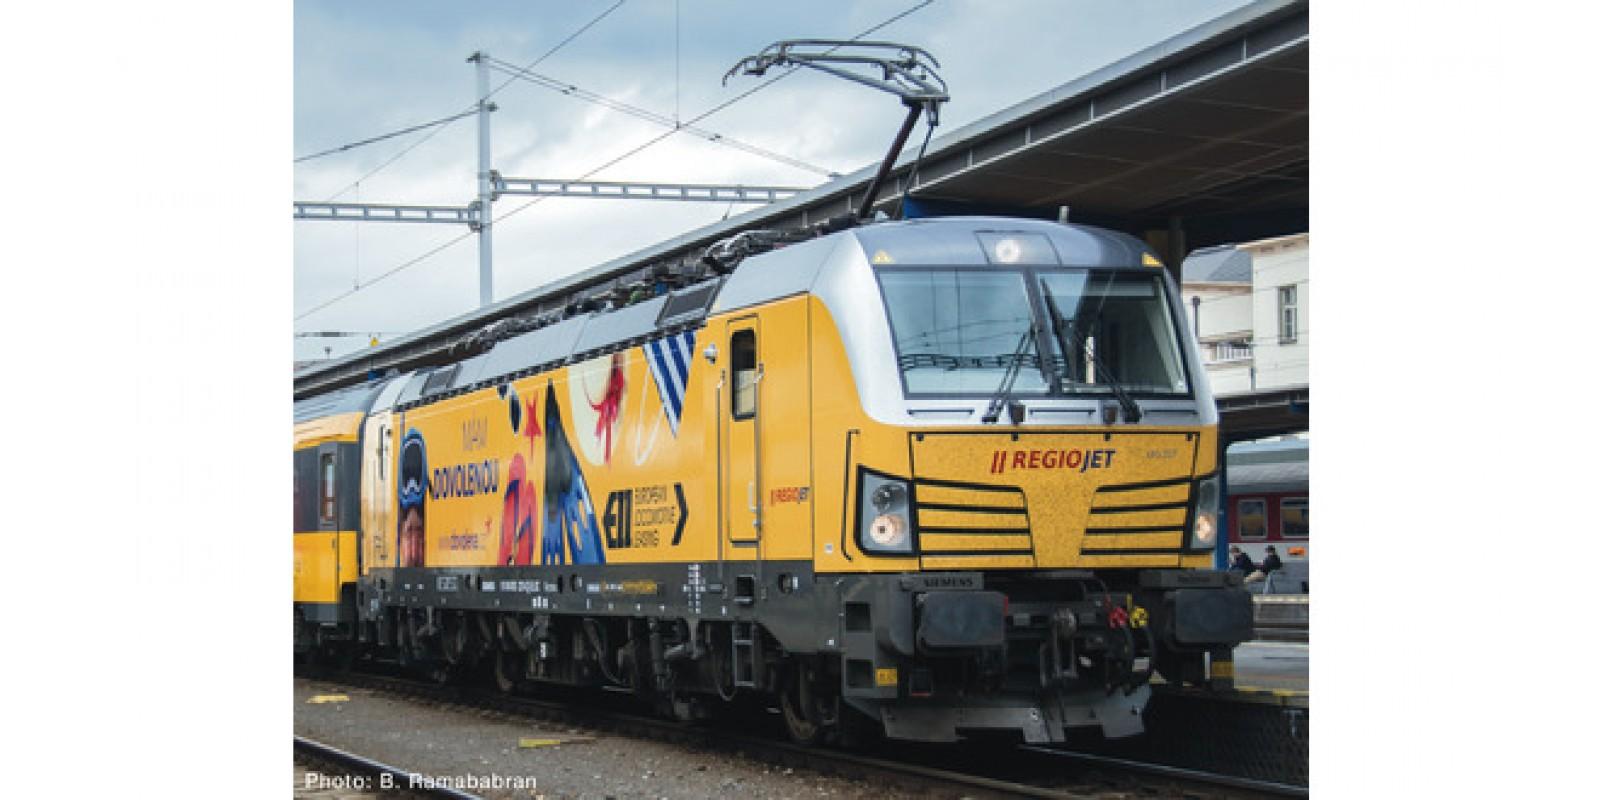 RO73940 - Electric locomotive 193 227, Regiojet